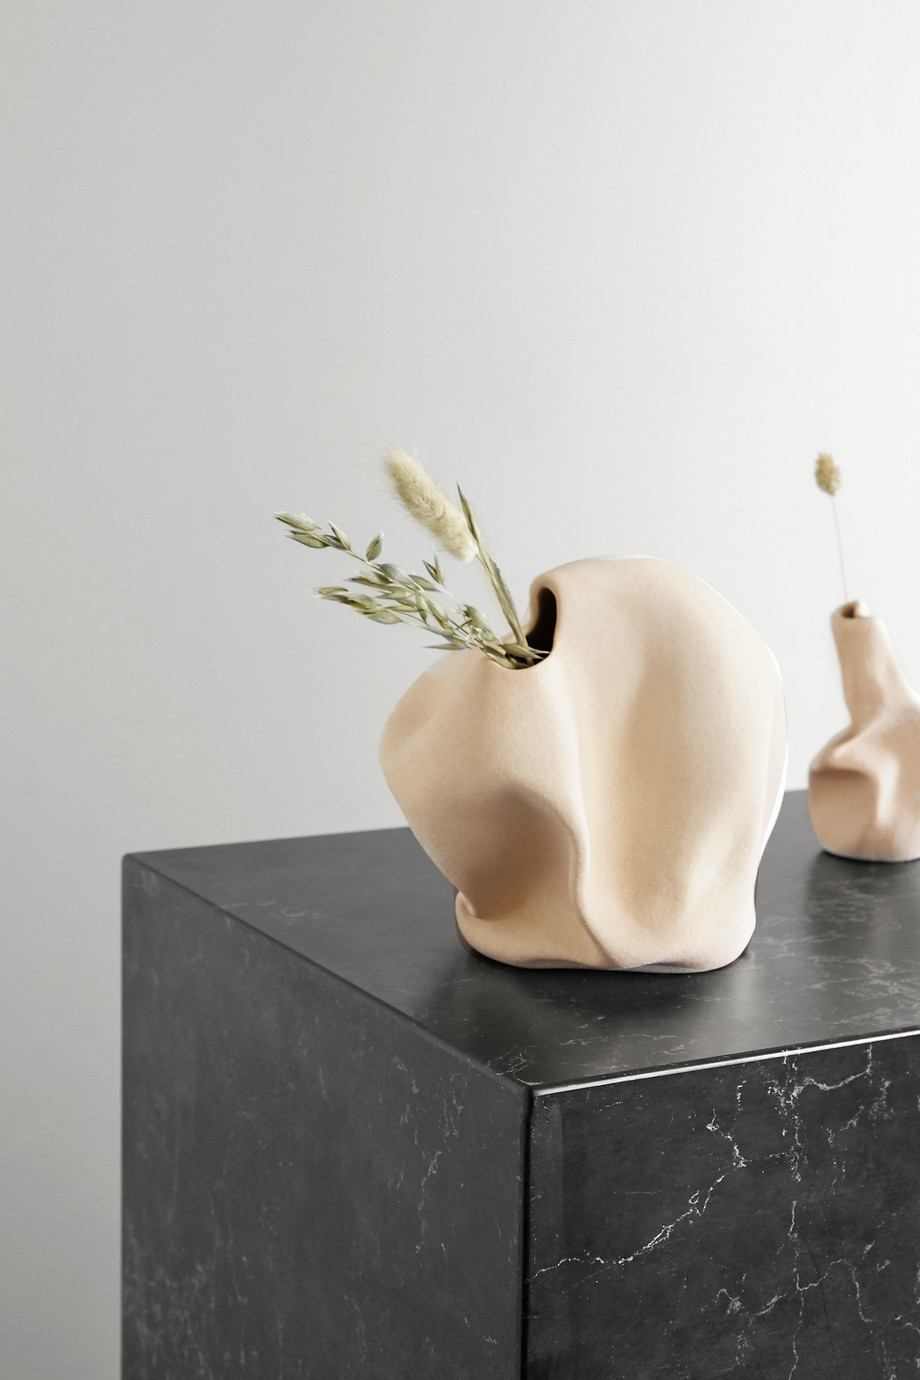 Completedworks + Ekaterina Bazhenova Yamasaki Goliath ceramic vase